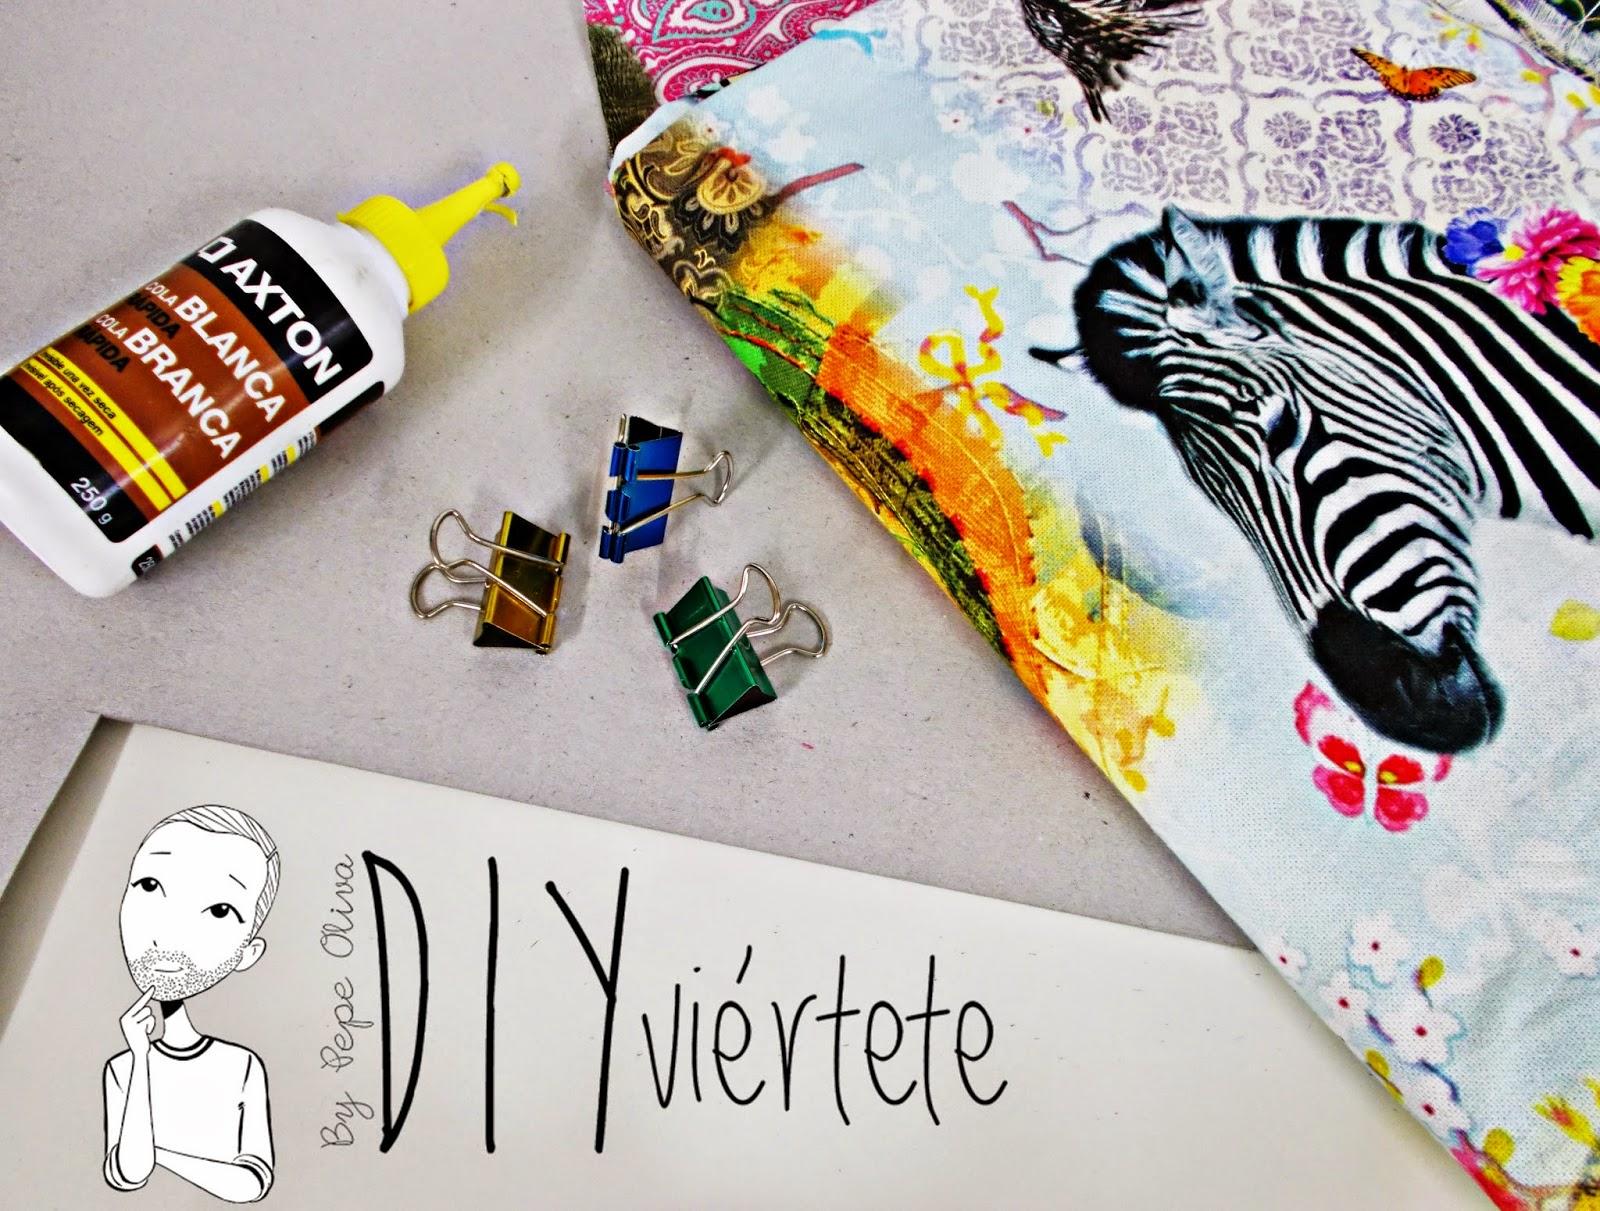 DIY-Do It Yourself-caja-cartón-selfpackaging-customizar-handbox-yodona-diyhuntersday-craftlovers-3